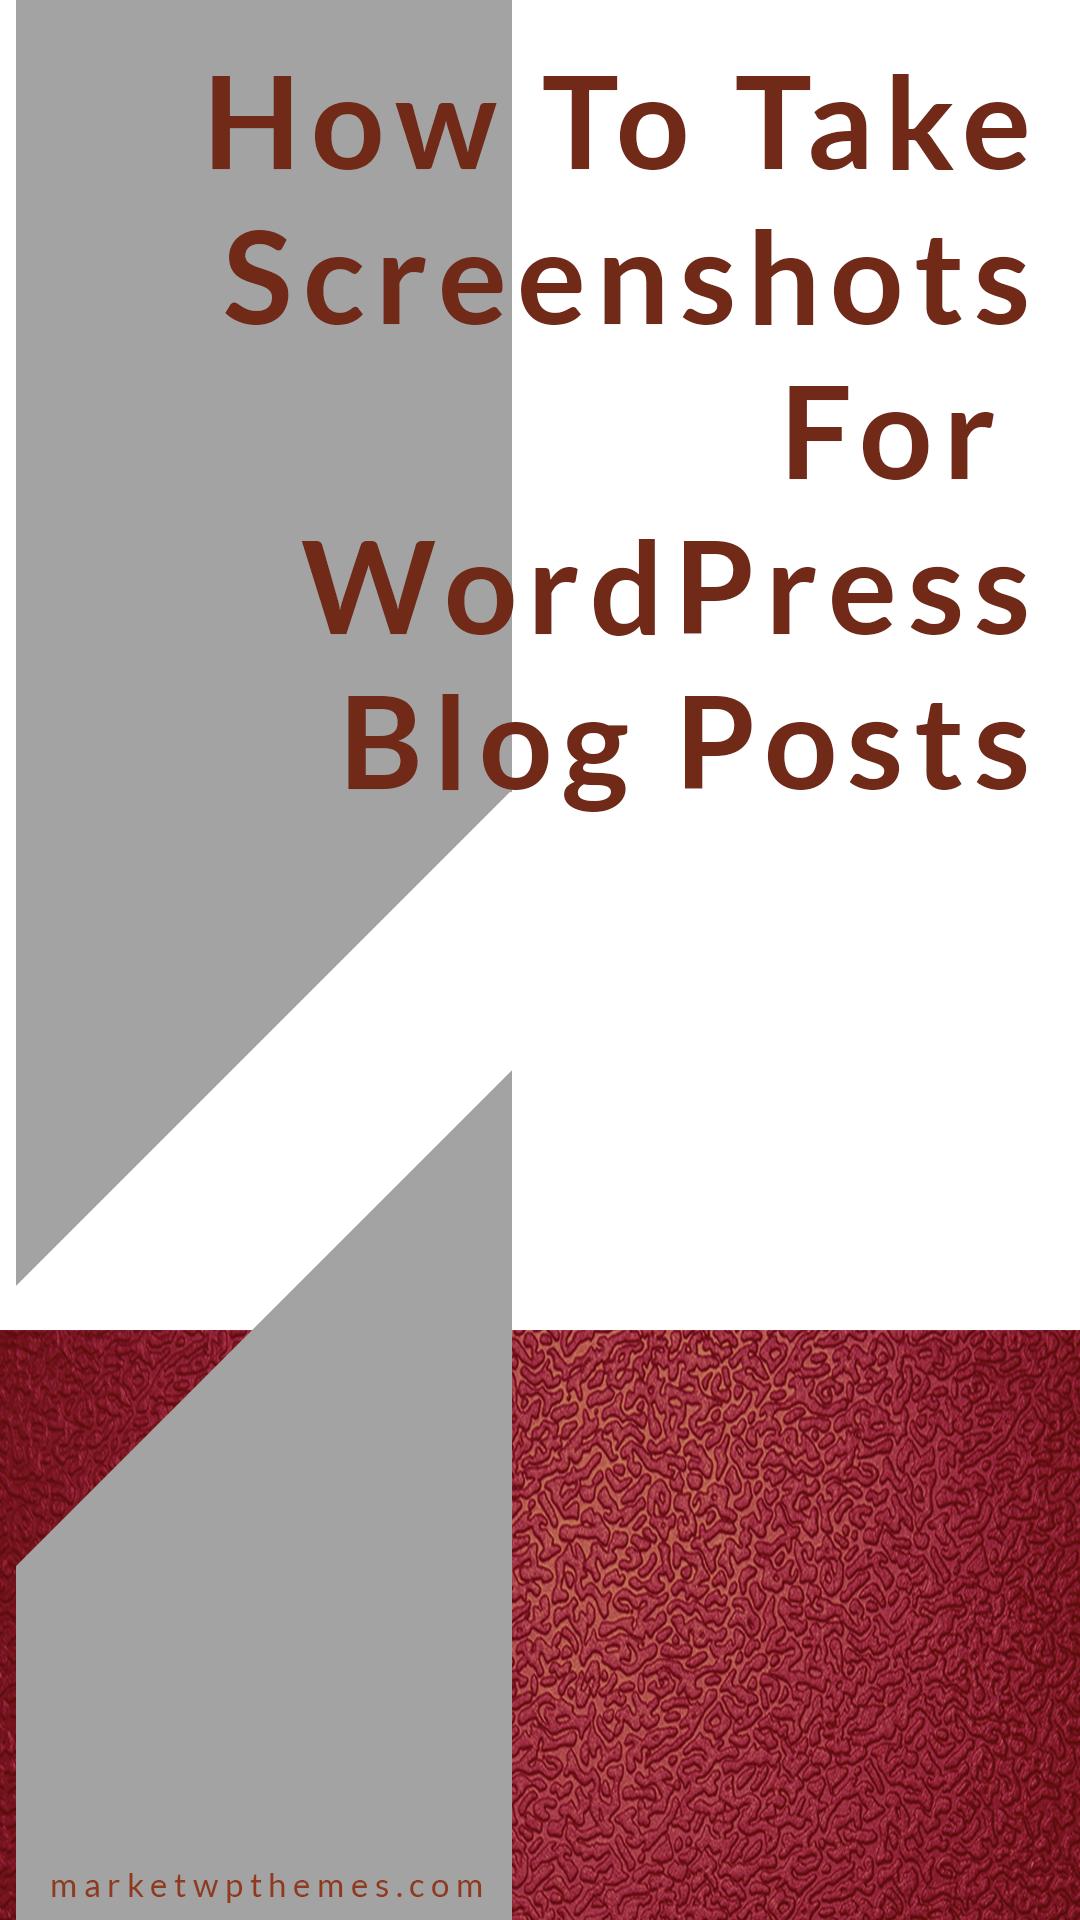 How To Take Screenshots For WordPress Blog Posts